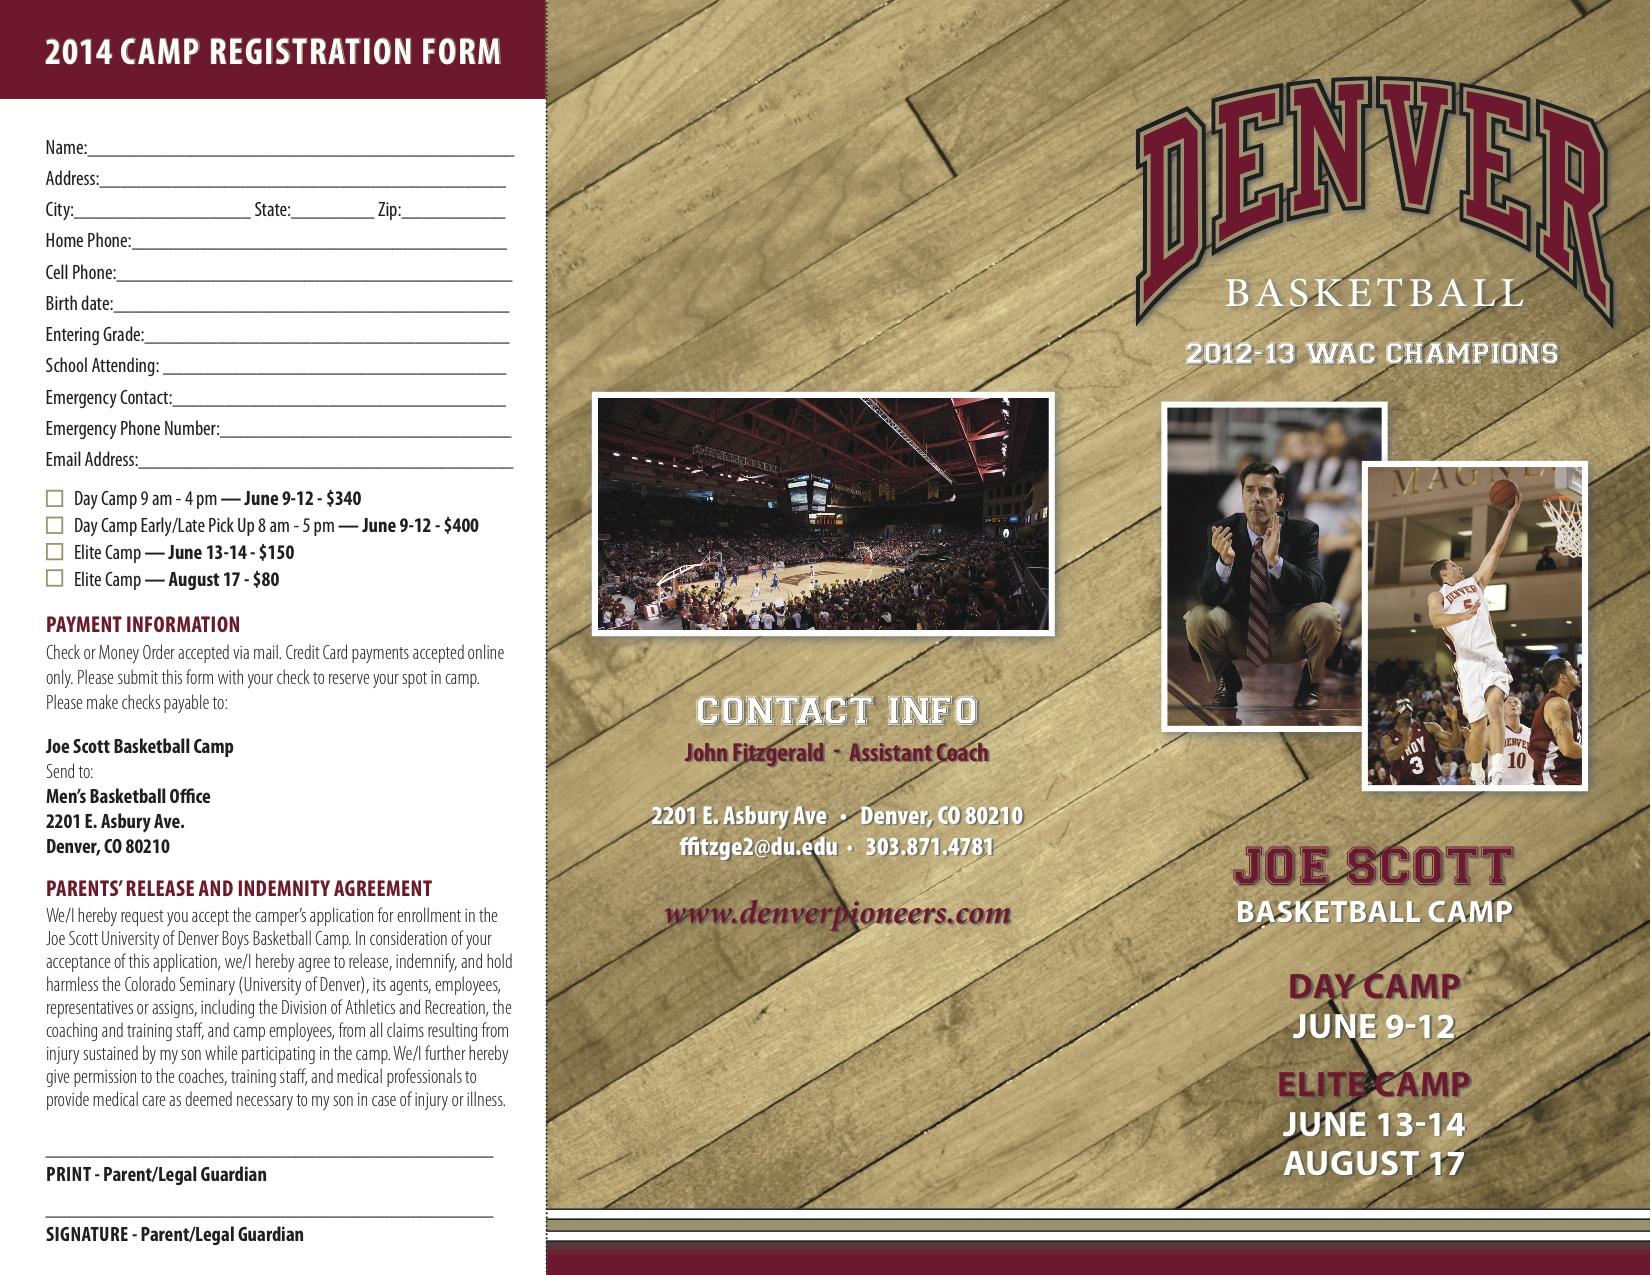 University of Denver – Joe Scott Basketball Camps 2014 -Elite Camp  June 13-14